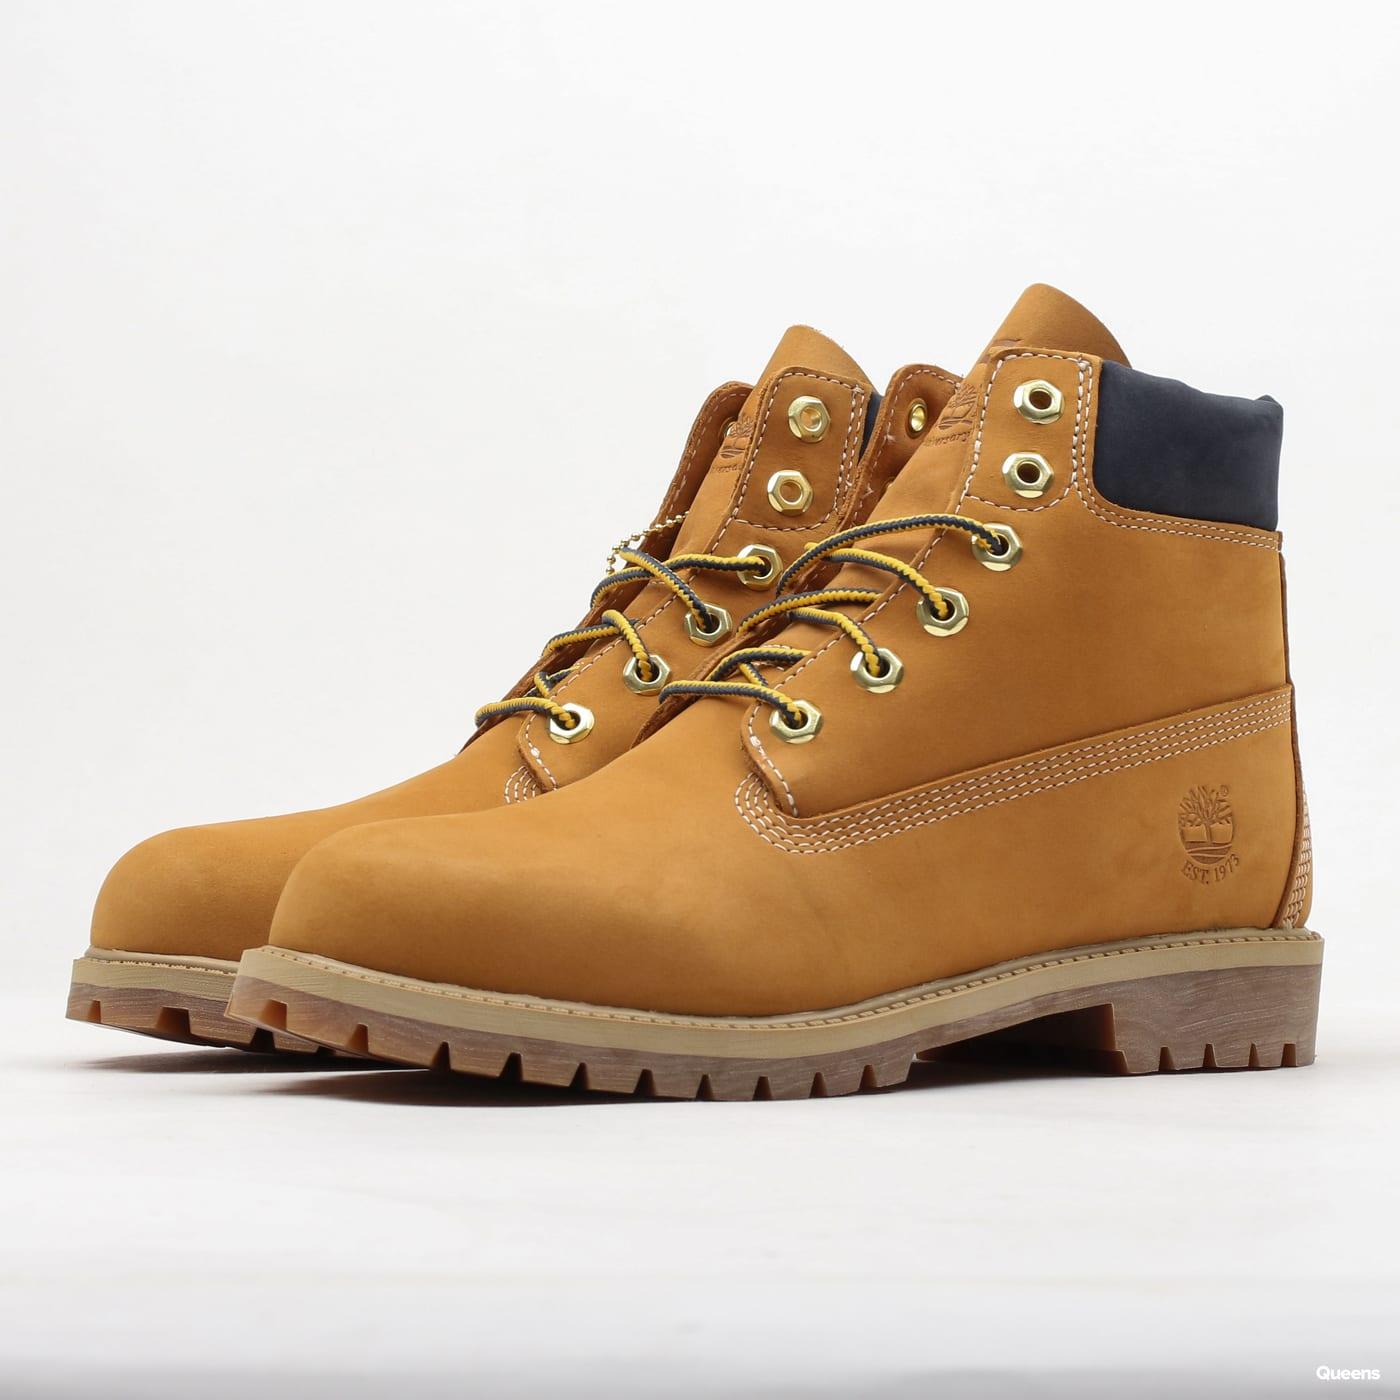 84fd60716f4 Dámské zimní boty Timberland 6 Inch Premium WP Boot (A1VE5 - WHE) – Queens  💚